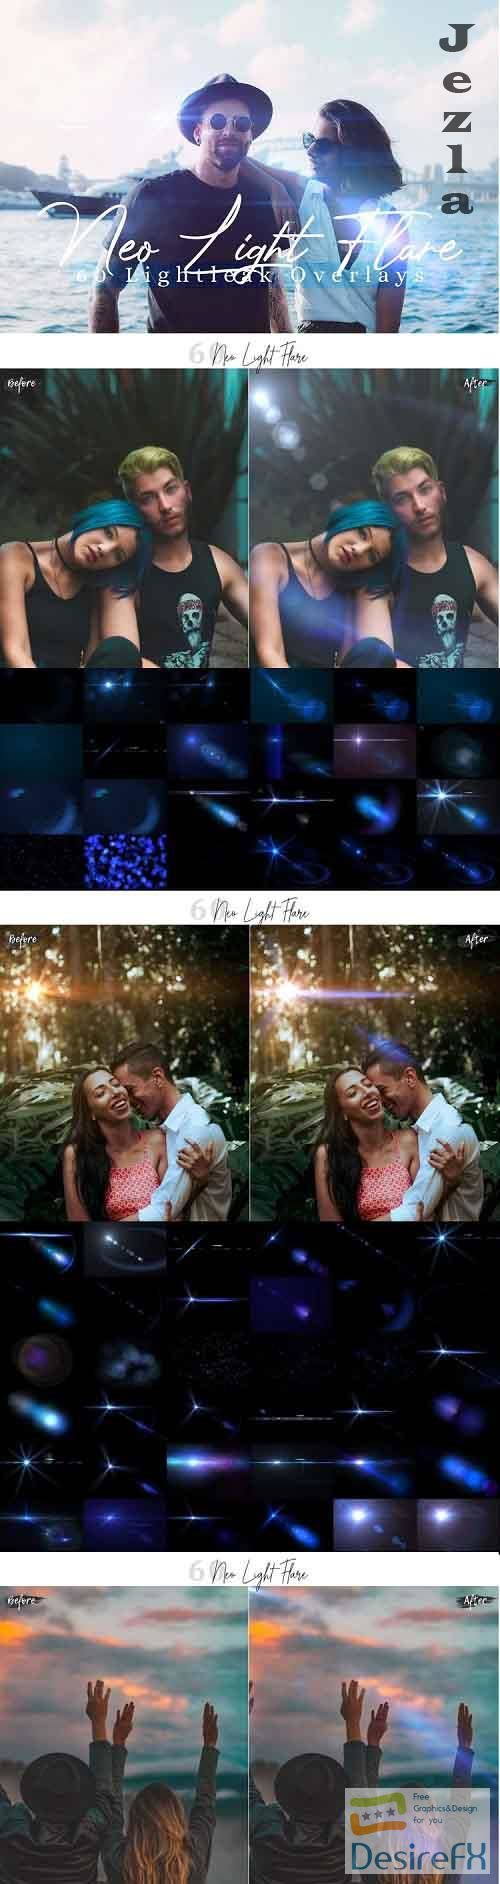 60 Neo Light Flare Effect Photo Overlays - 589214